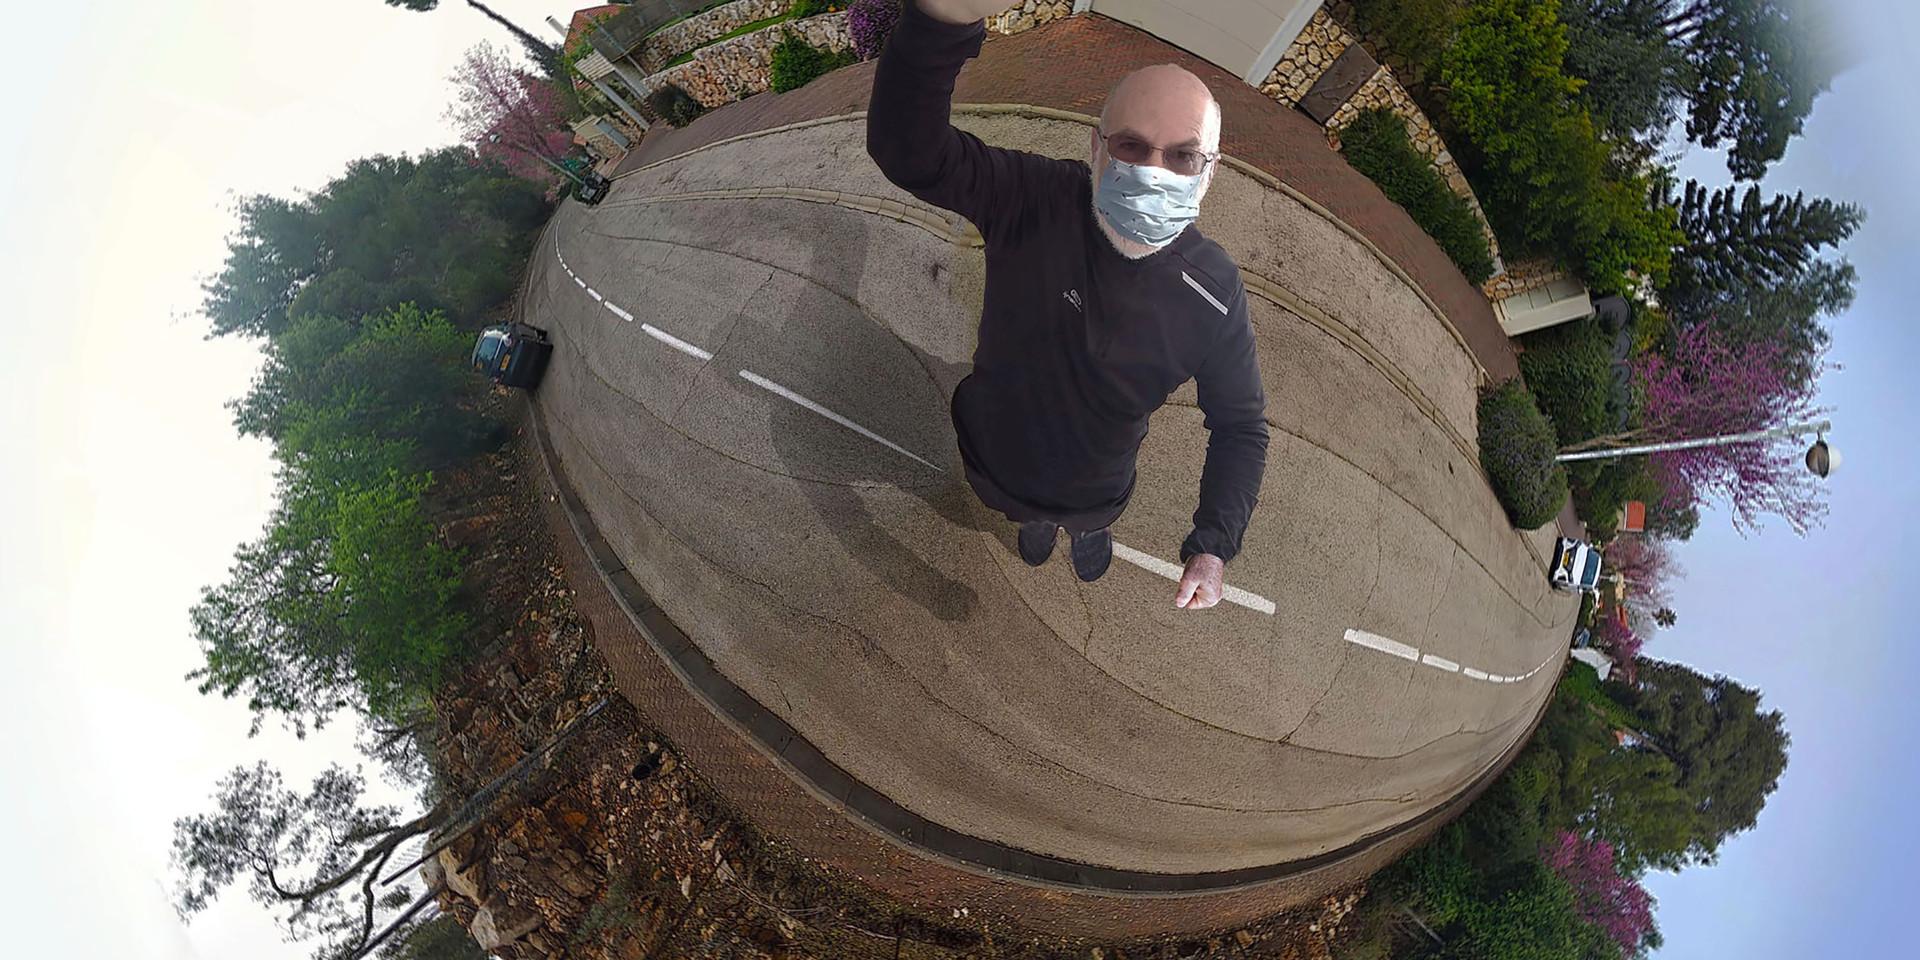 My World within 300 Feet